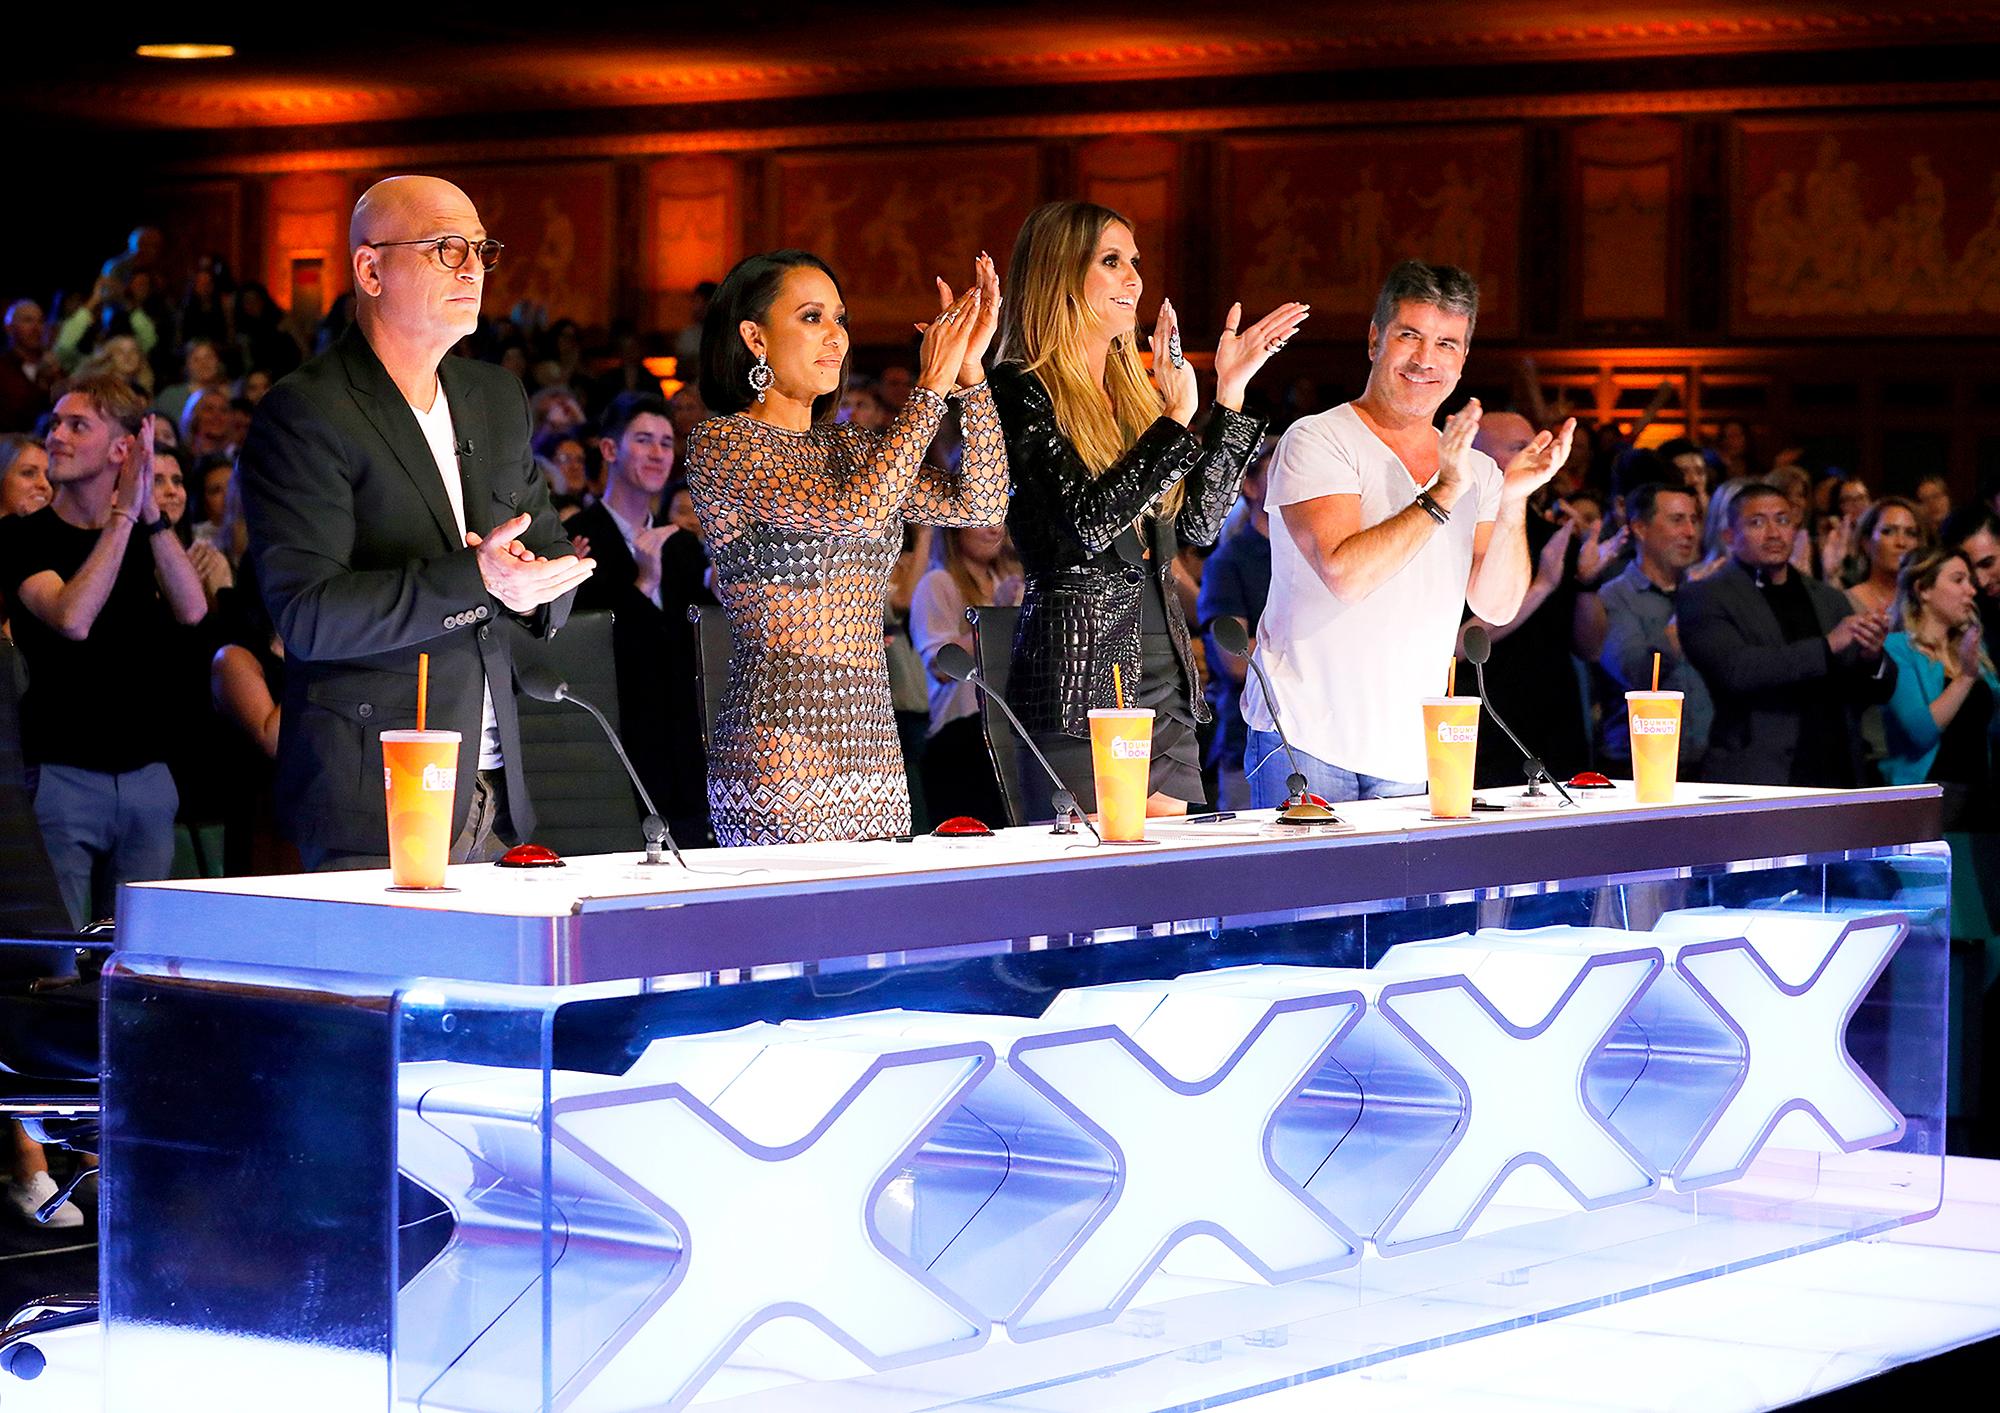 Deaf Singer Mandy Harvey Amazes 'America's Got Talent' Judges, Earns Simon Cowell's Golden Buzzer